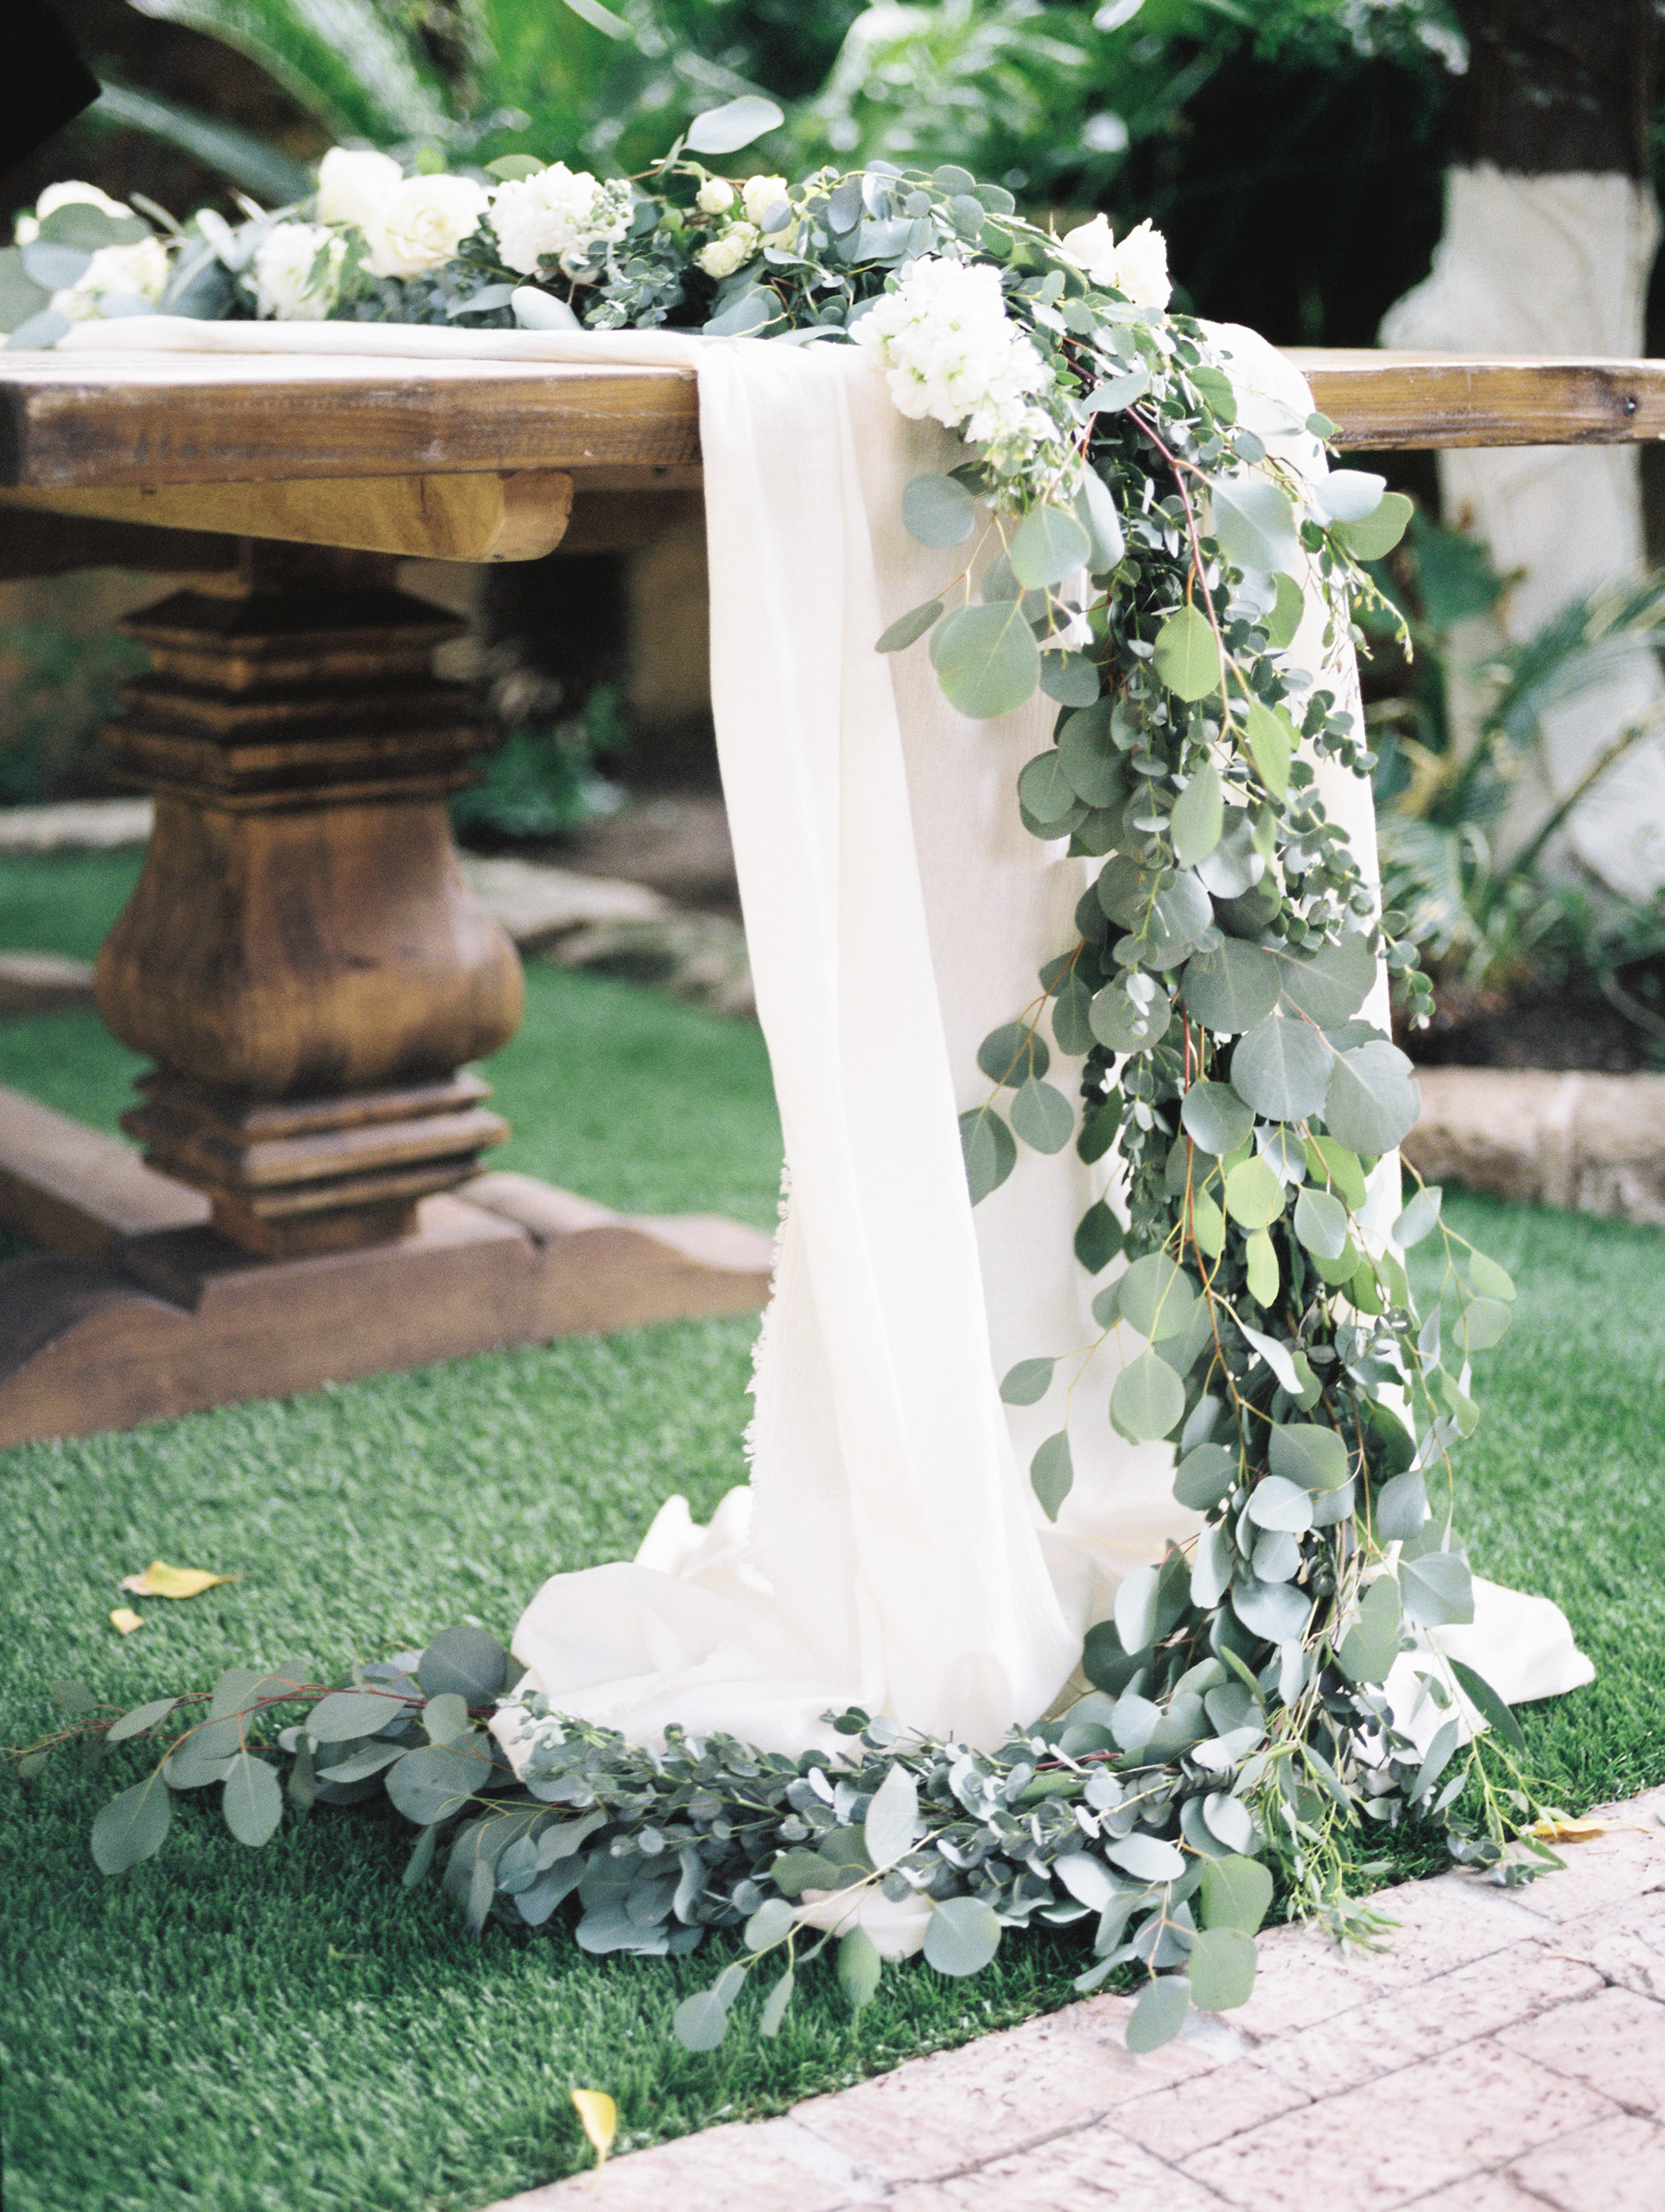 Photos of Linda & Steve's Wedding by Saje Photography